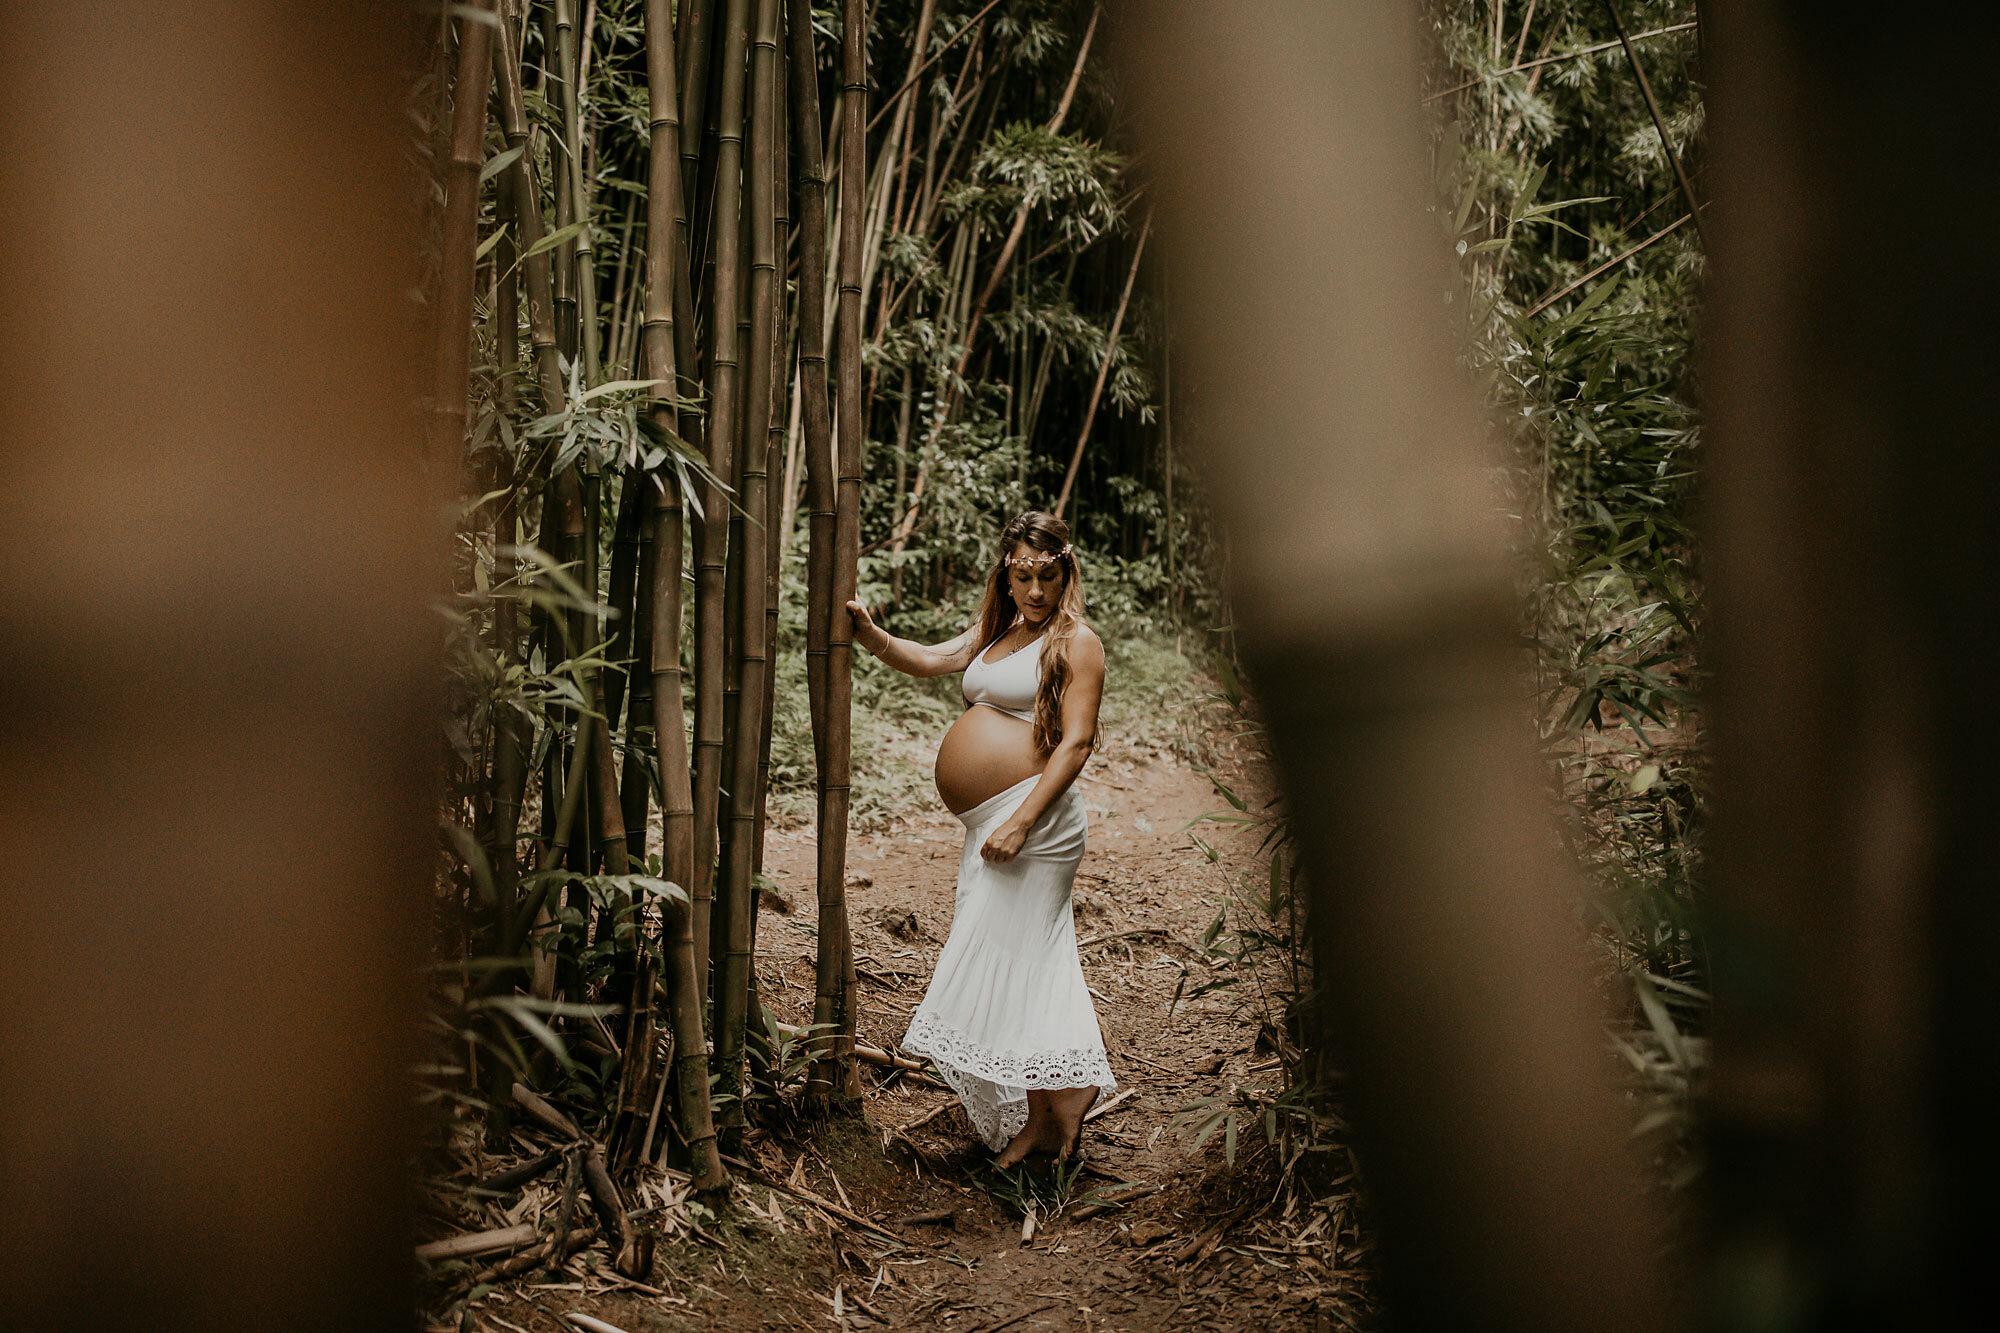 Oahu Hawaii Maternity Photographer Waterfall Maternity The Sophia Co 15.jpg